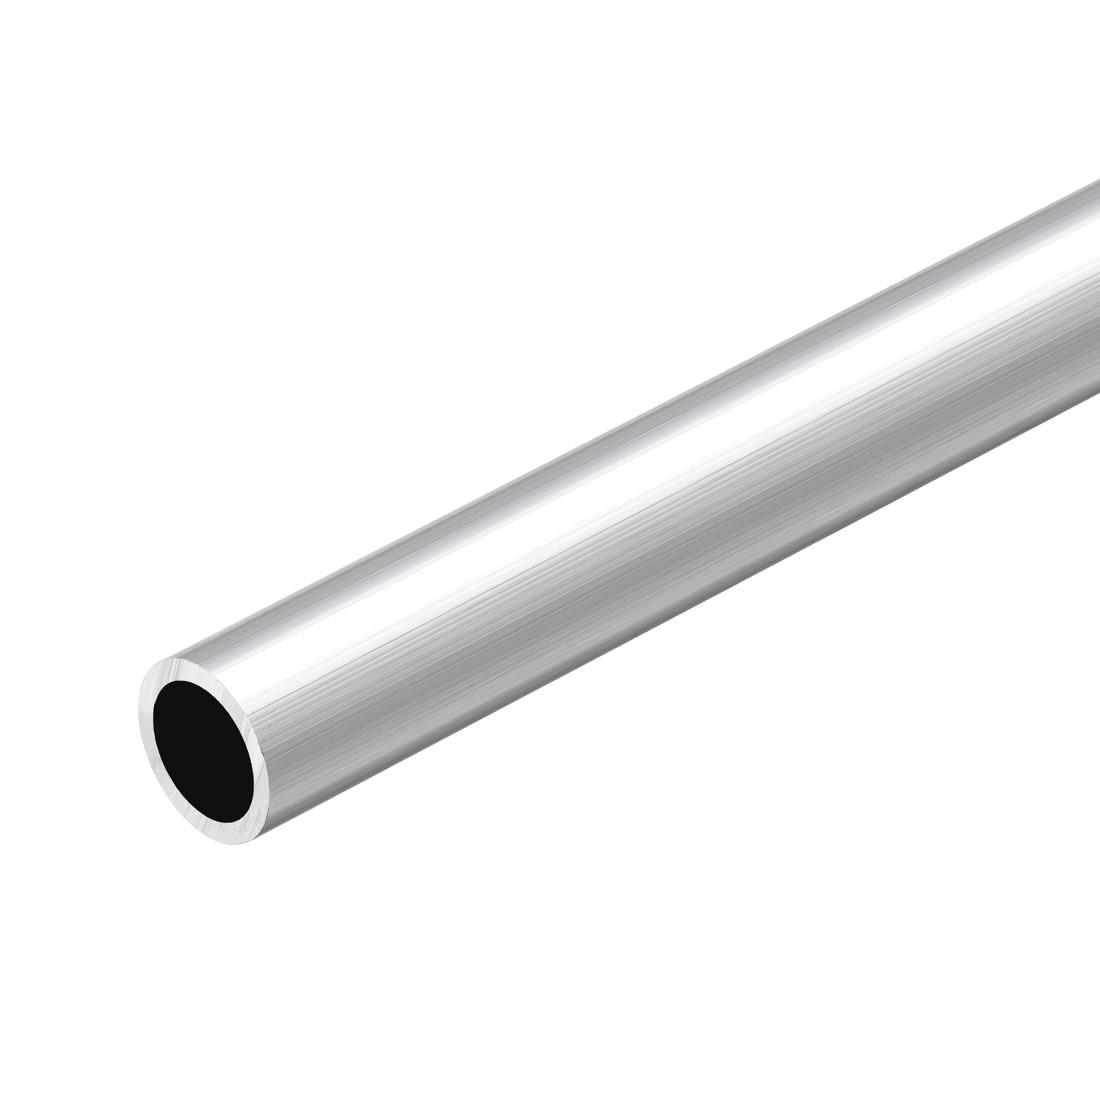 Uxcell 14mm-15mm OD 7mm-13mm Inner Dia Seamless Aluminum Straight Tubing 6063 Aluminum Round Tube 300mm Length